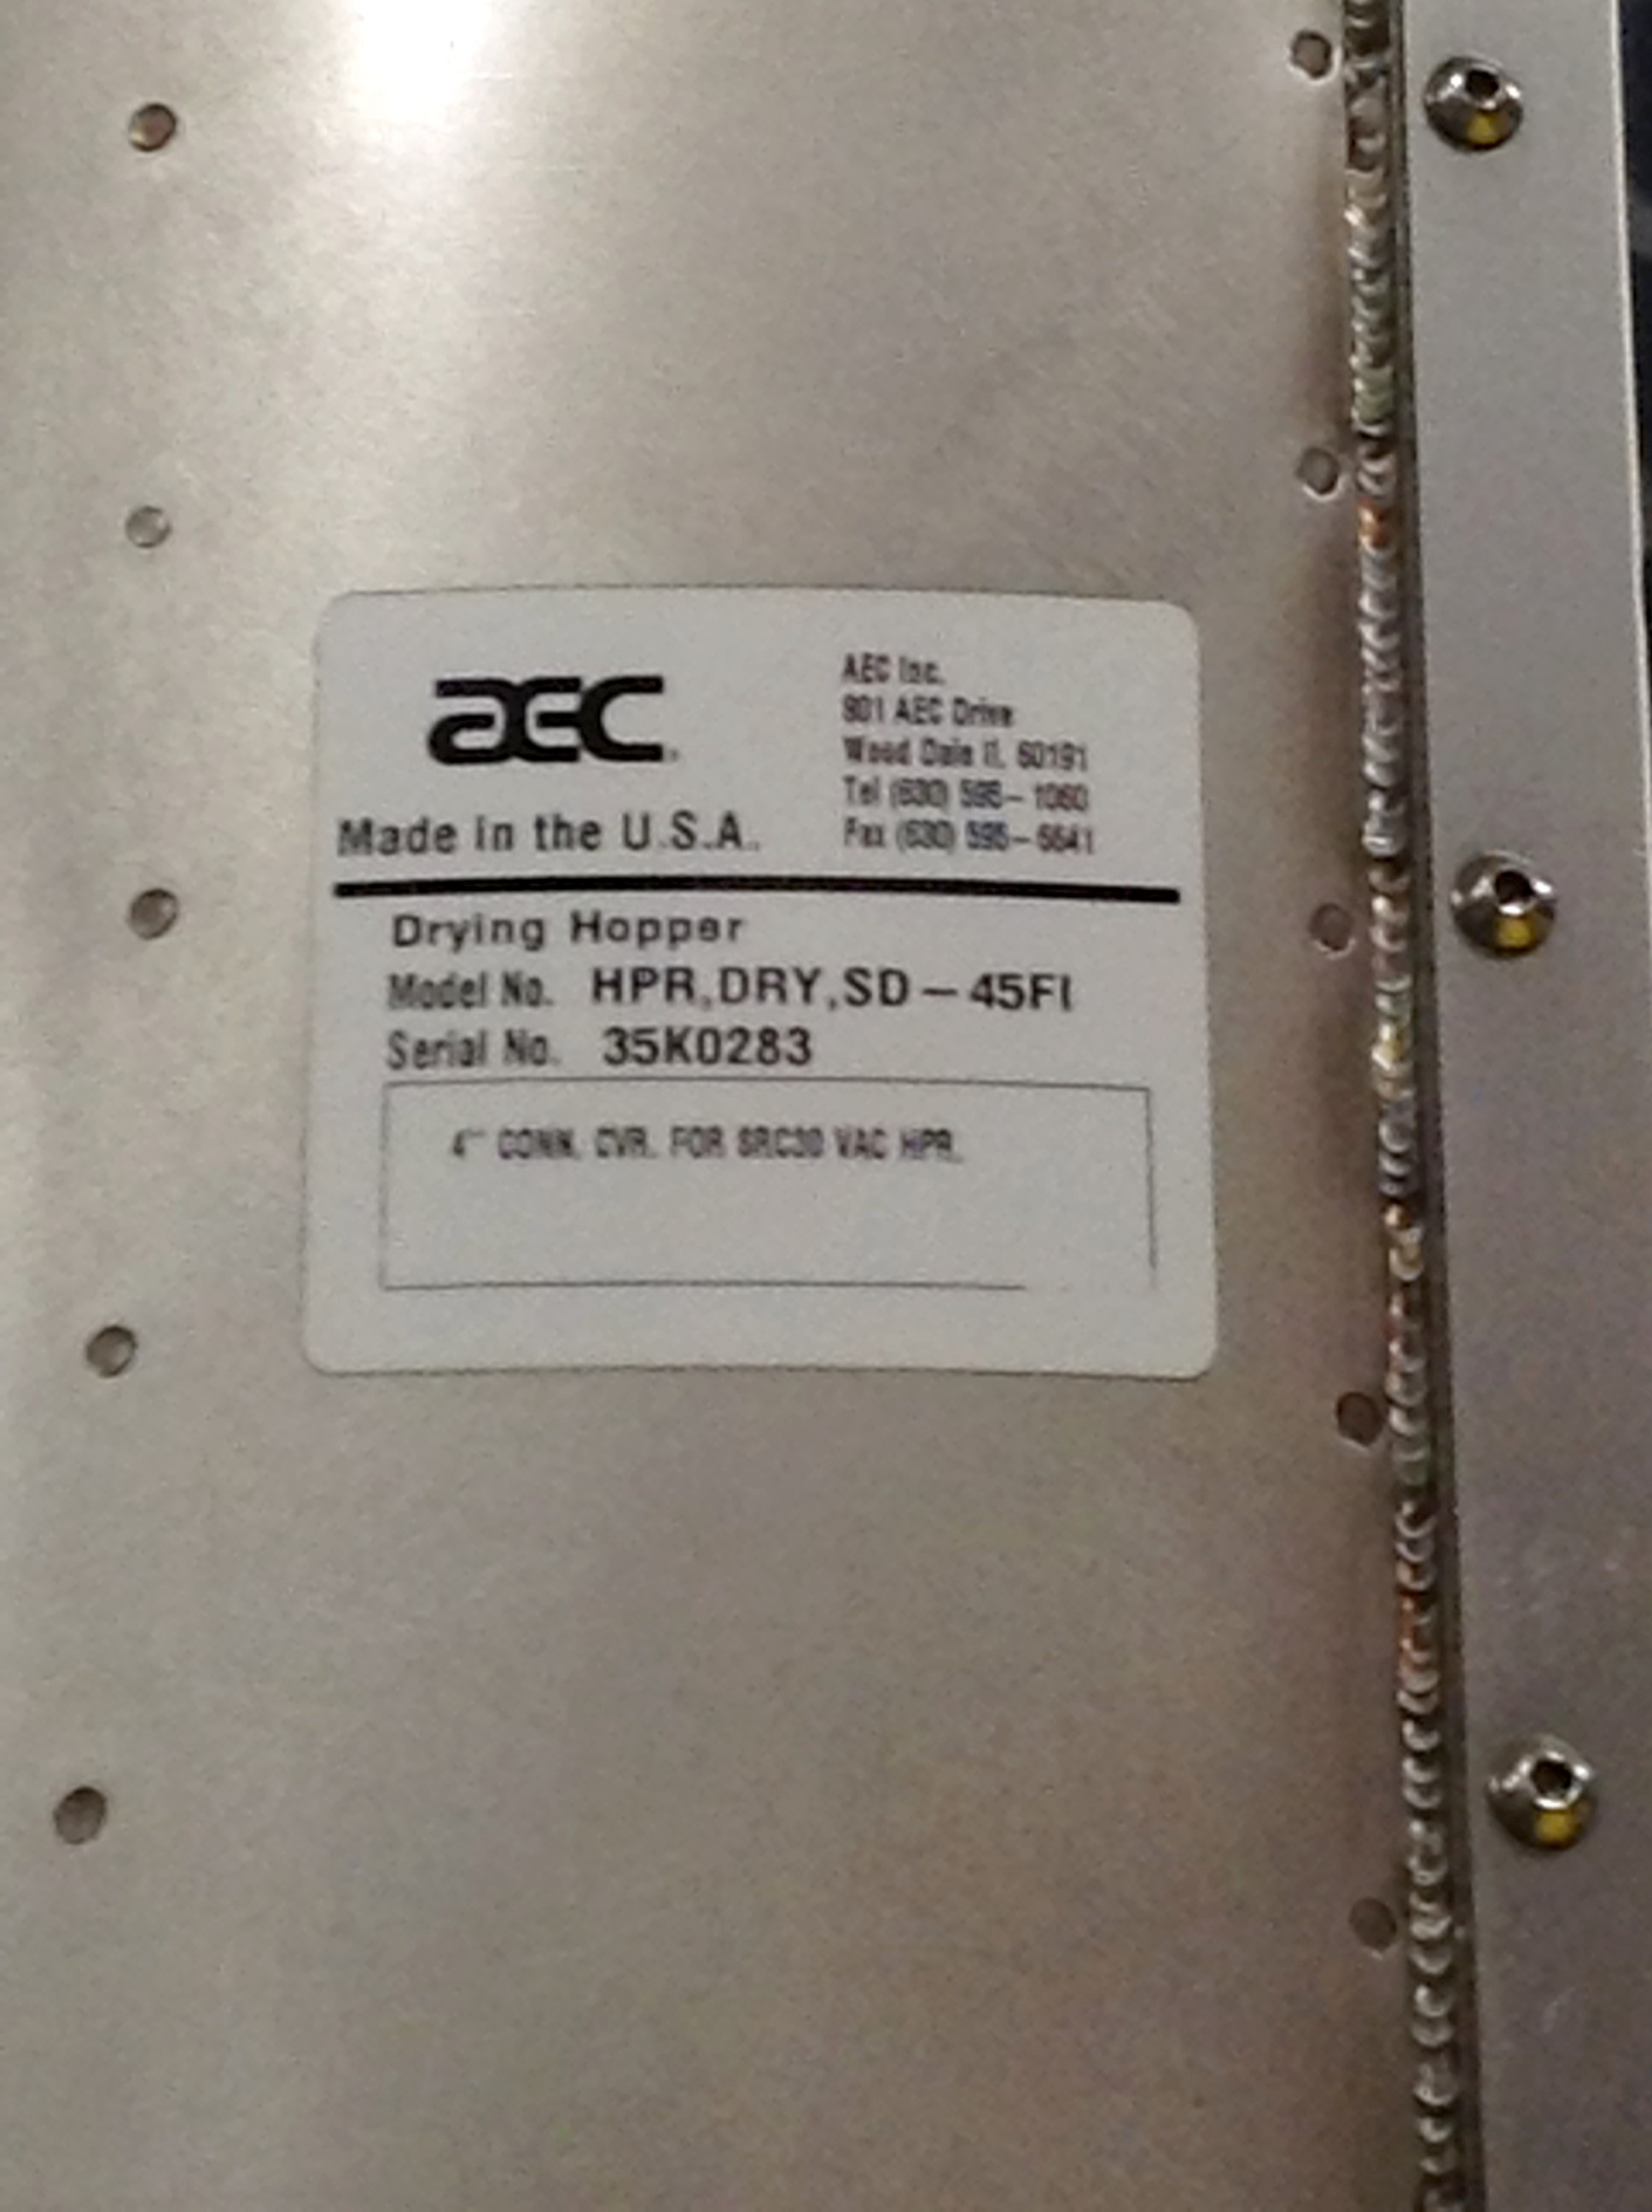 Aec HPR.DRY.SD-45FI